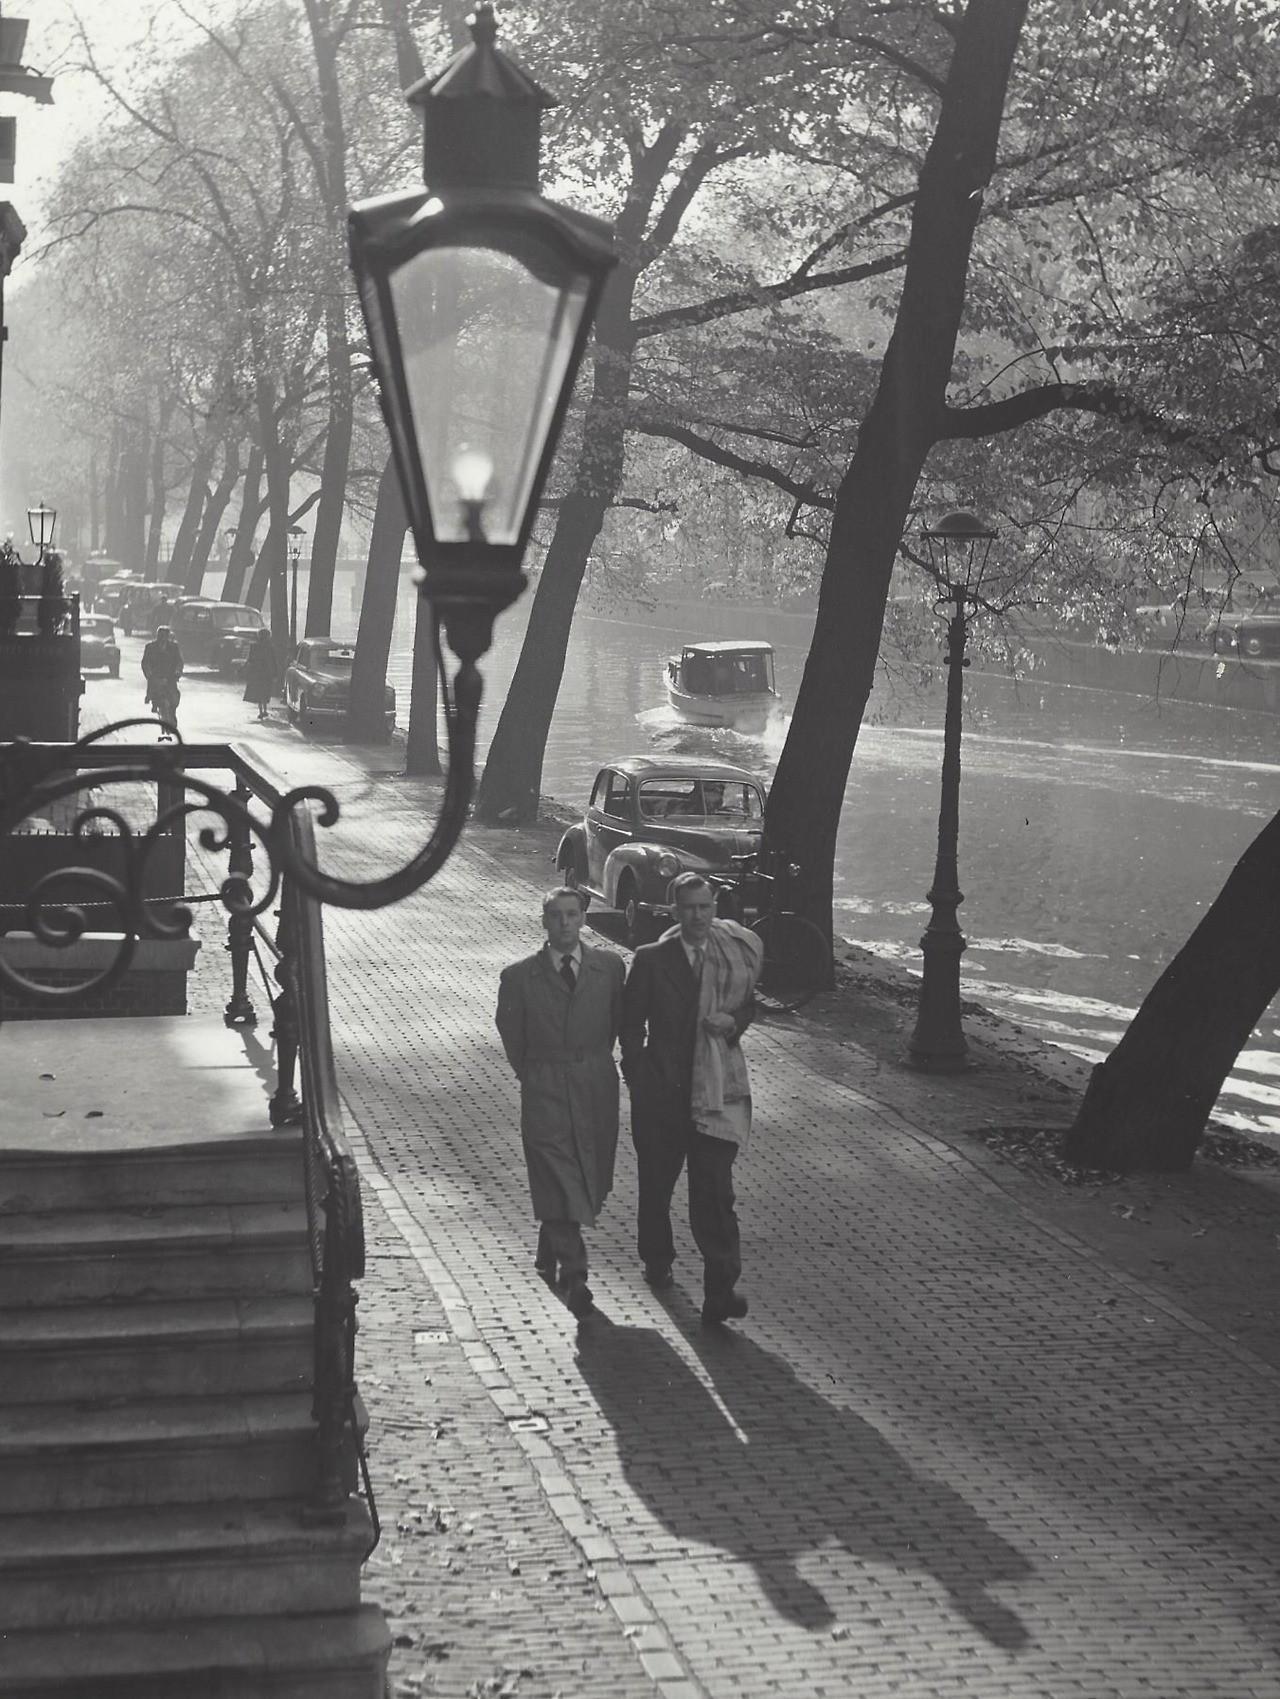 Осень в Амстердаме, 1950-е. Фотограф Кис Шерер